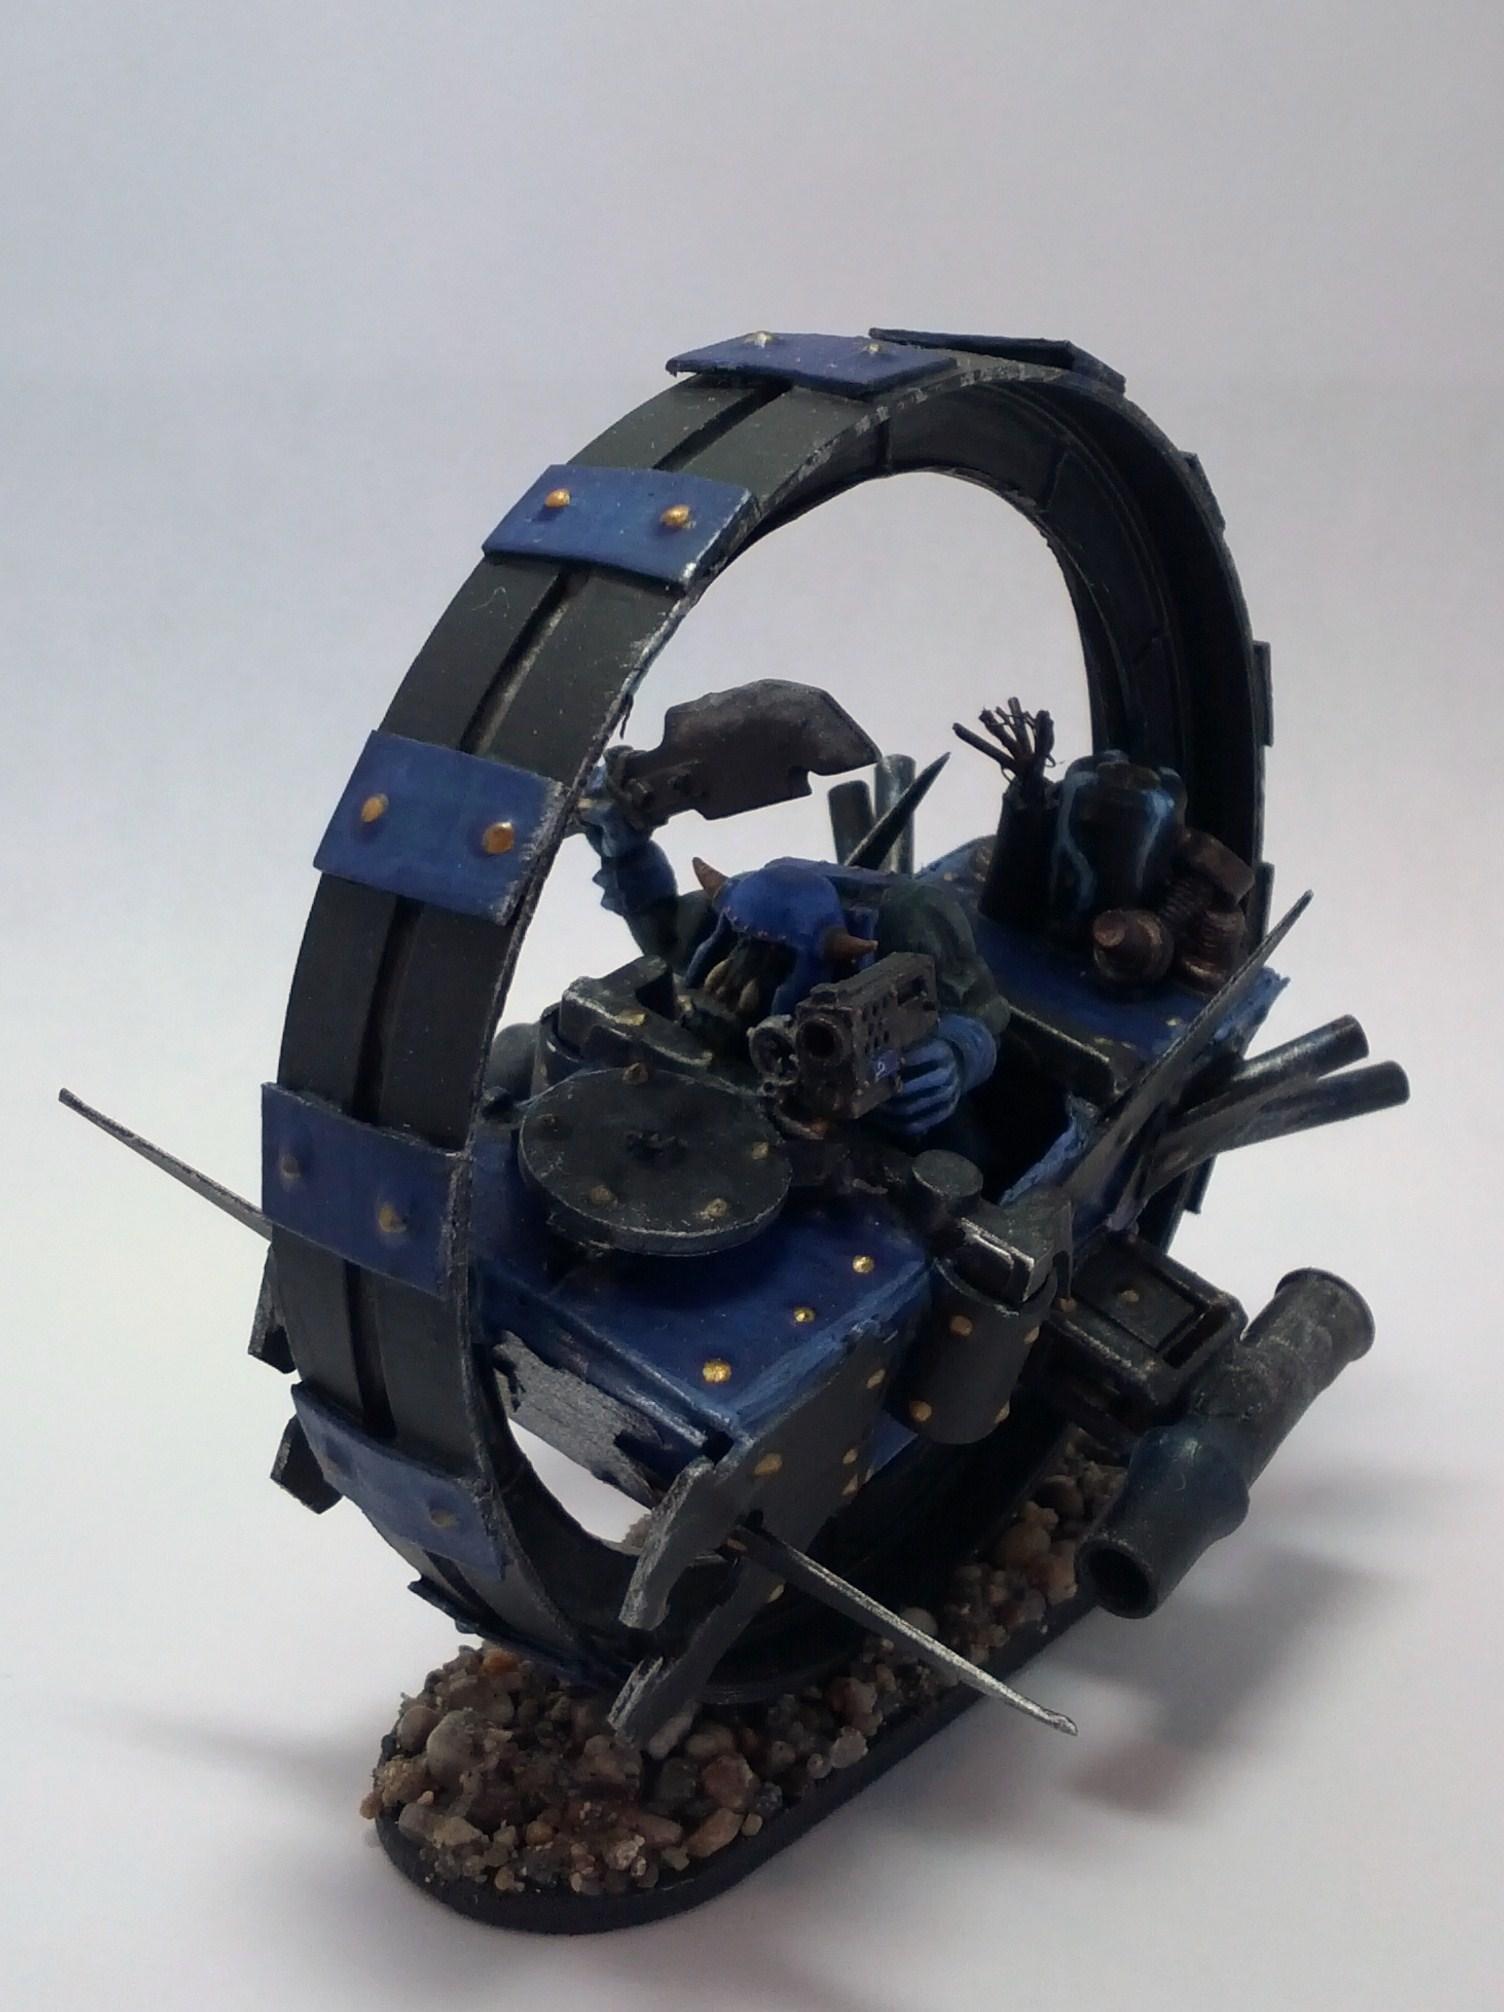 Bike, Monowheel, Orks, Scratch Build, Warbike